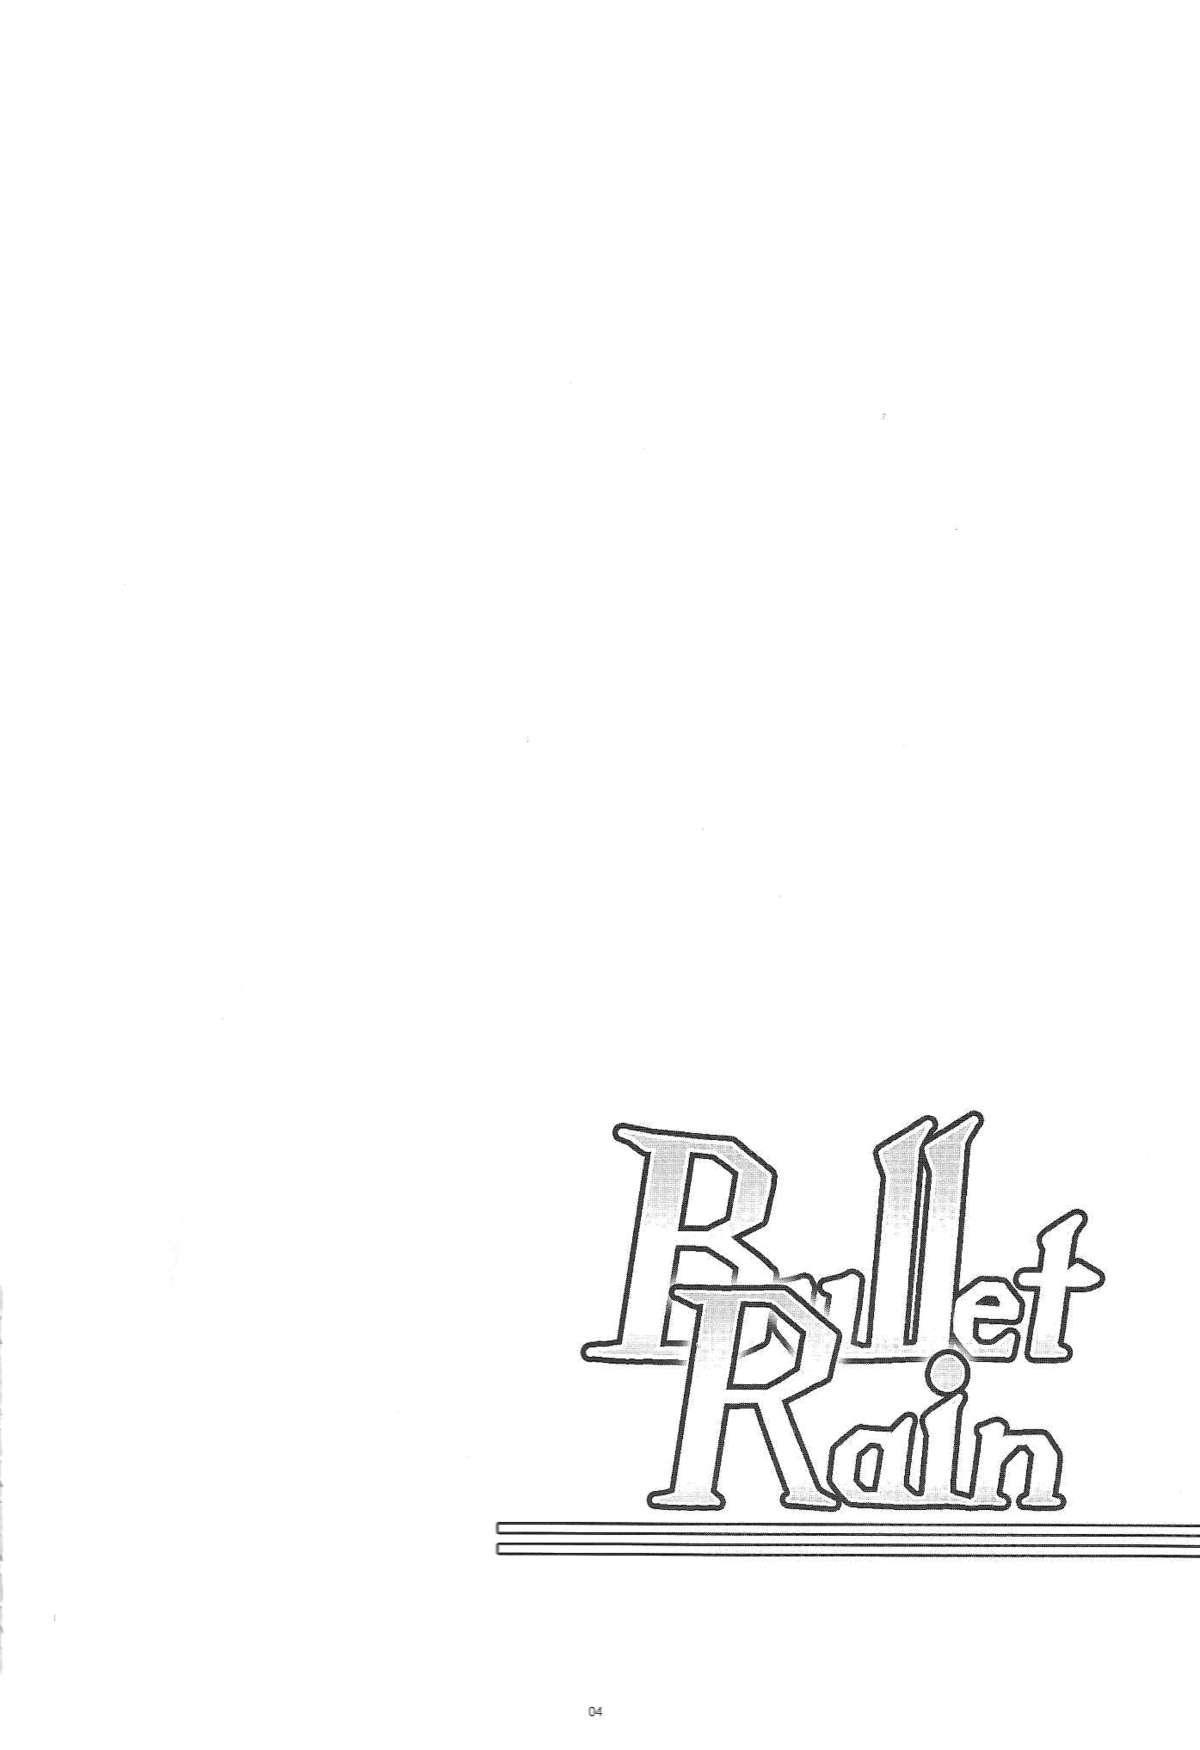 Bullet Rain 2